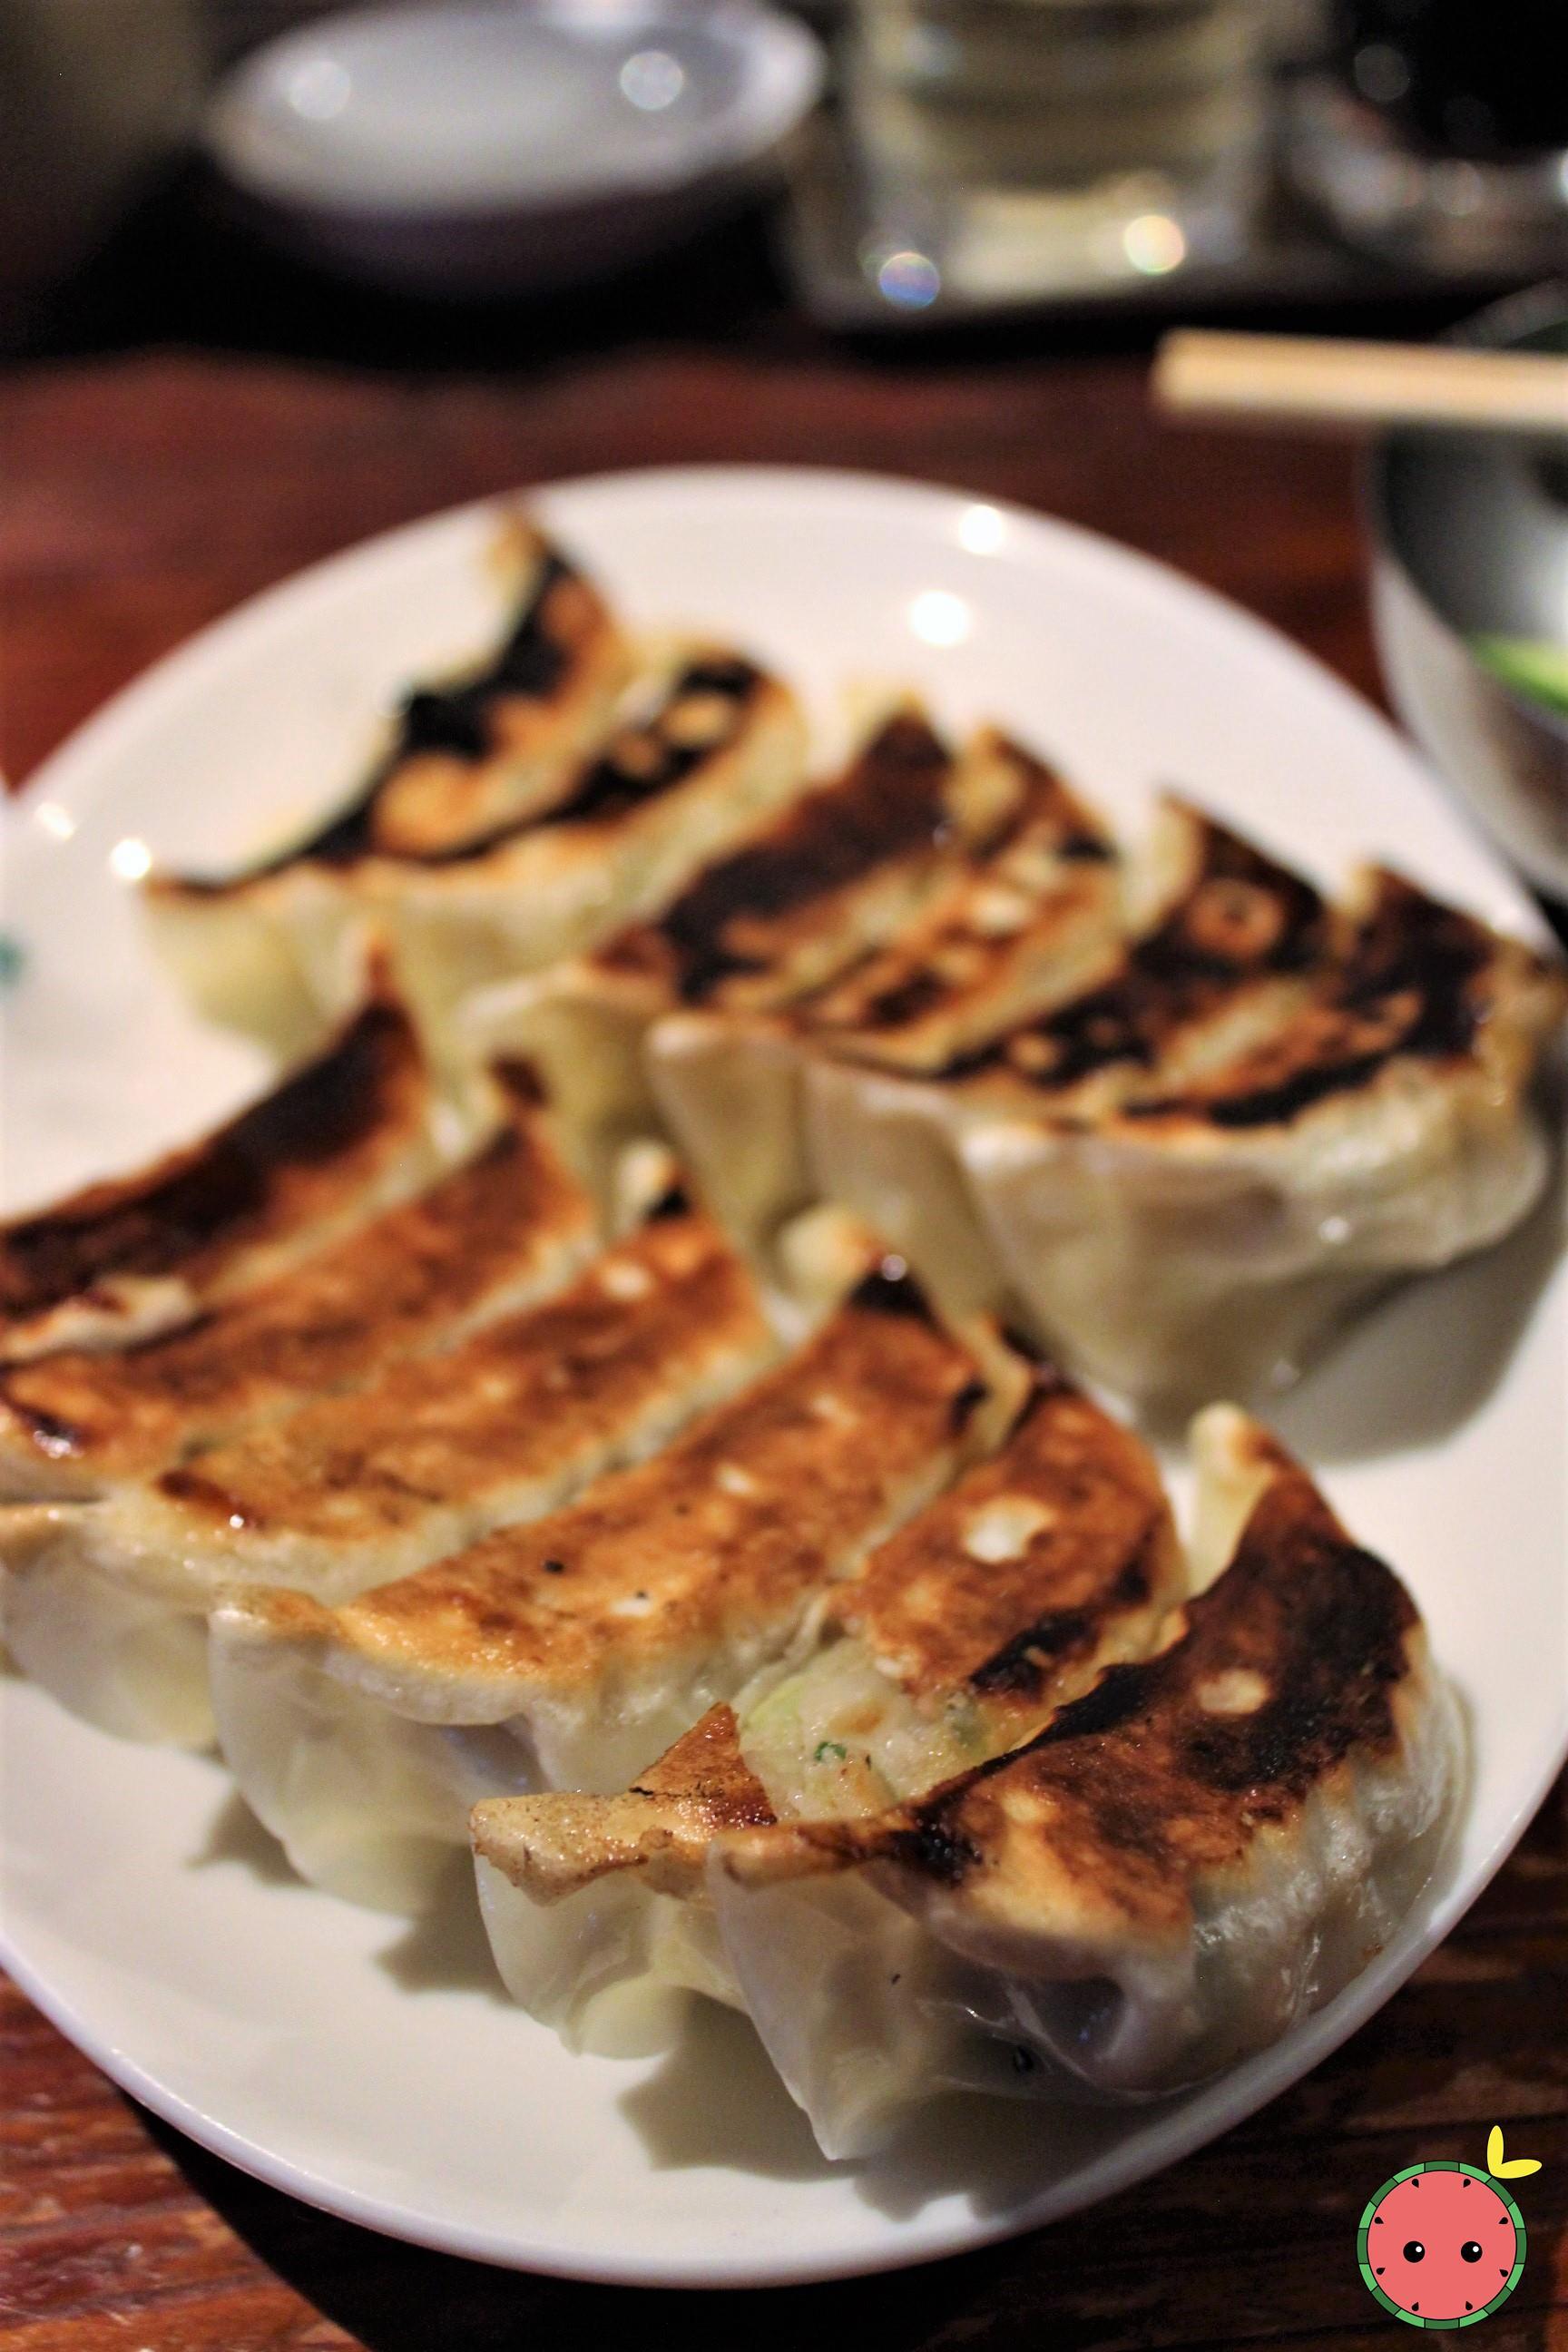 Pan Fried Dumplings with Garlic & Chives